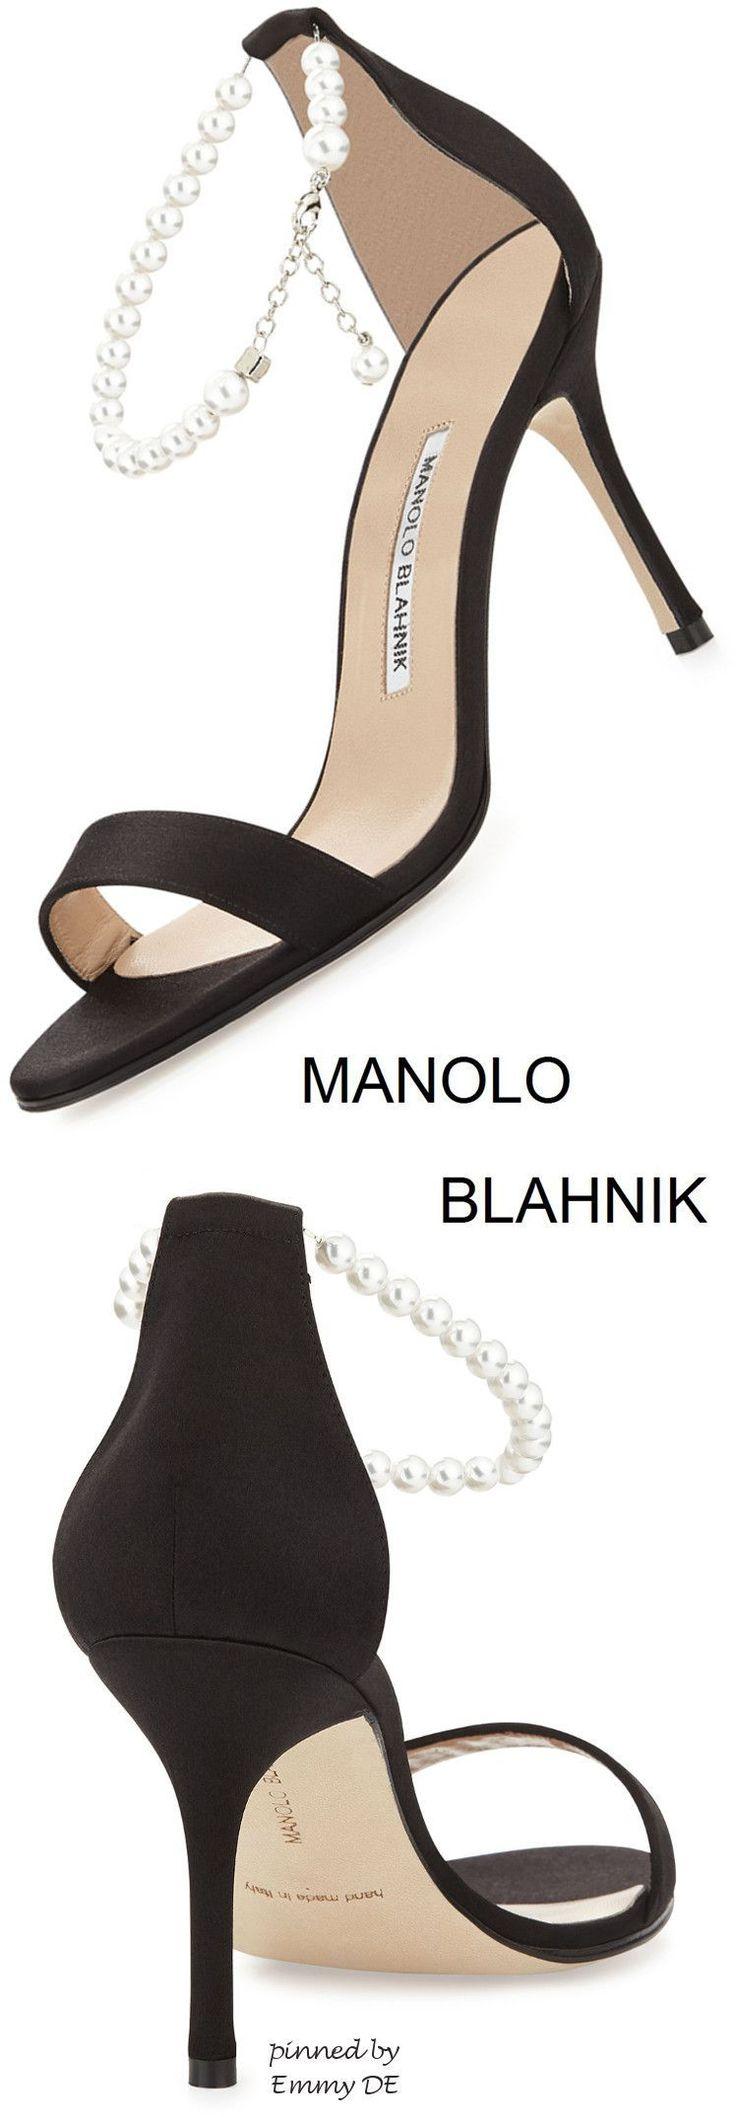 Emmy DE * Manolo Blahnik Chaos Pearly Ankle-Wrap Sandal #manoloblahnikheelszapatos #manoloblahnikheels2017